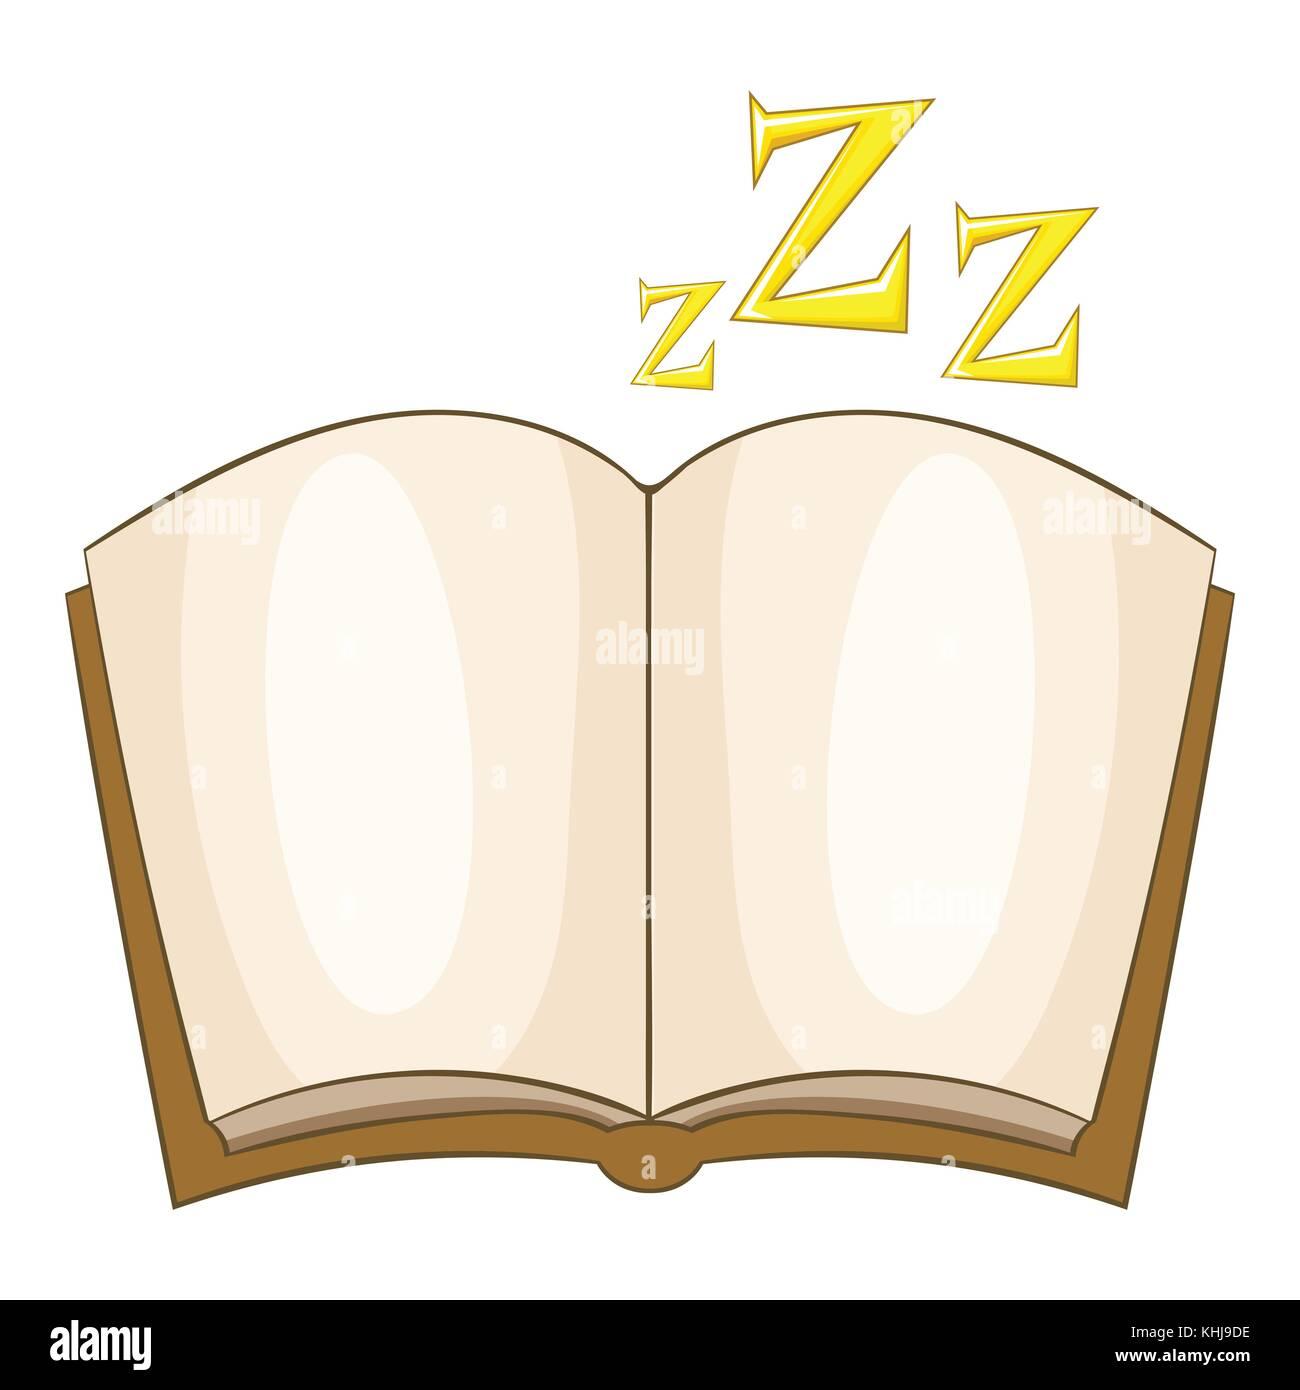 Bedtime story icon, cartoon style - Stock Image